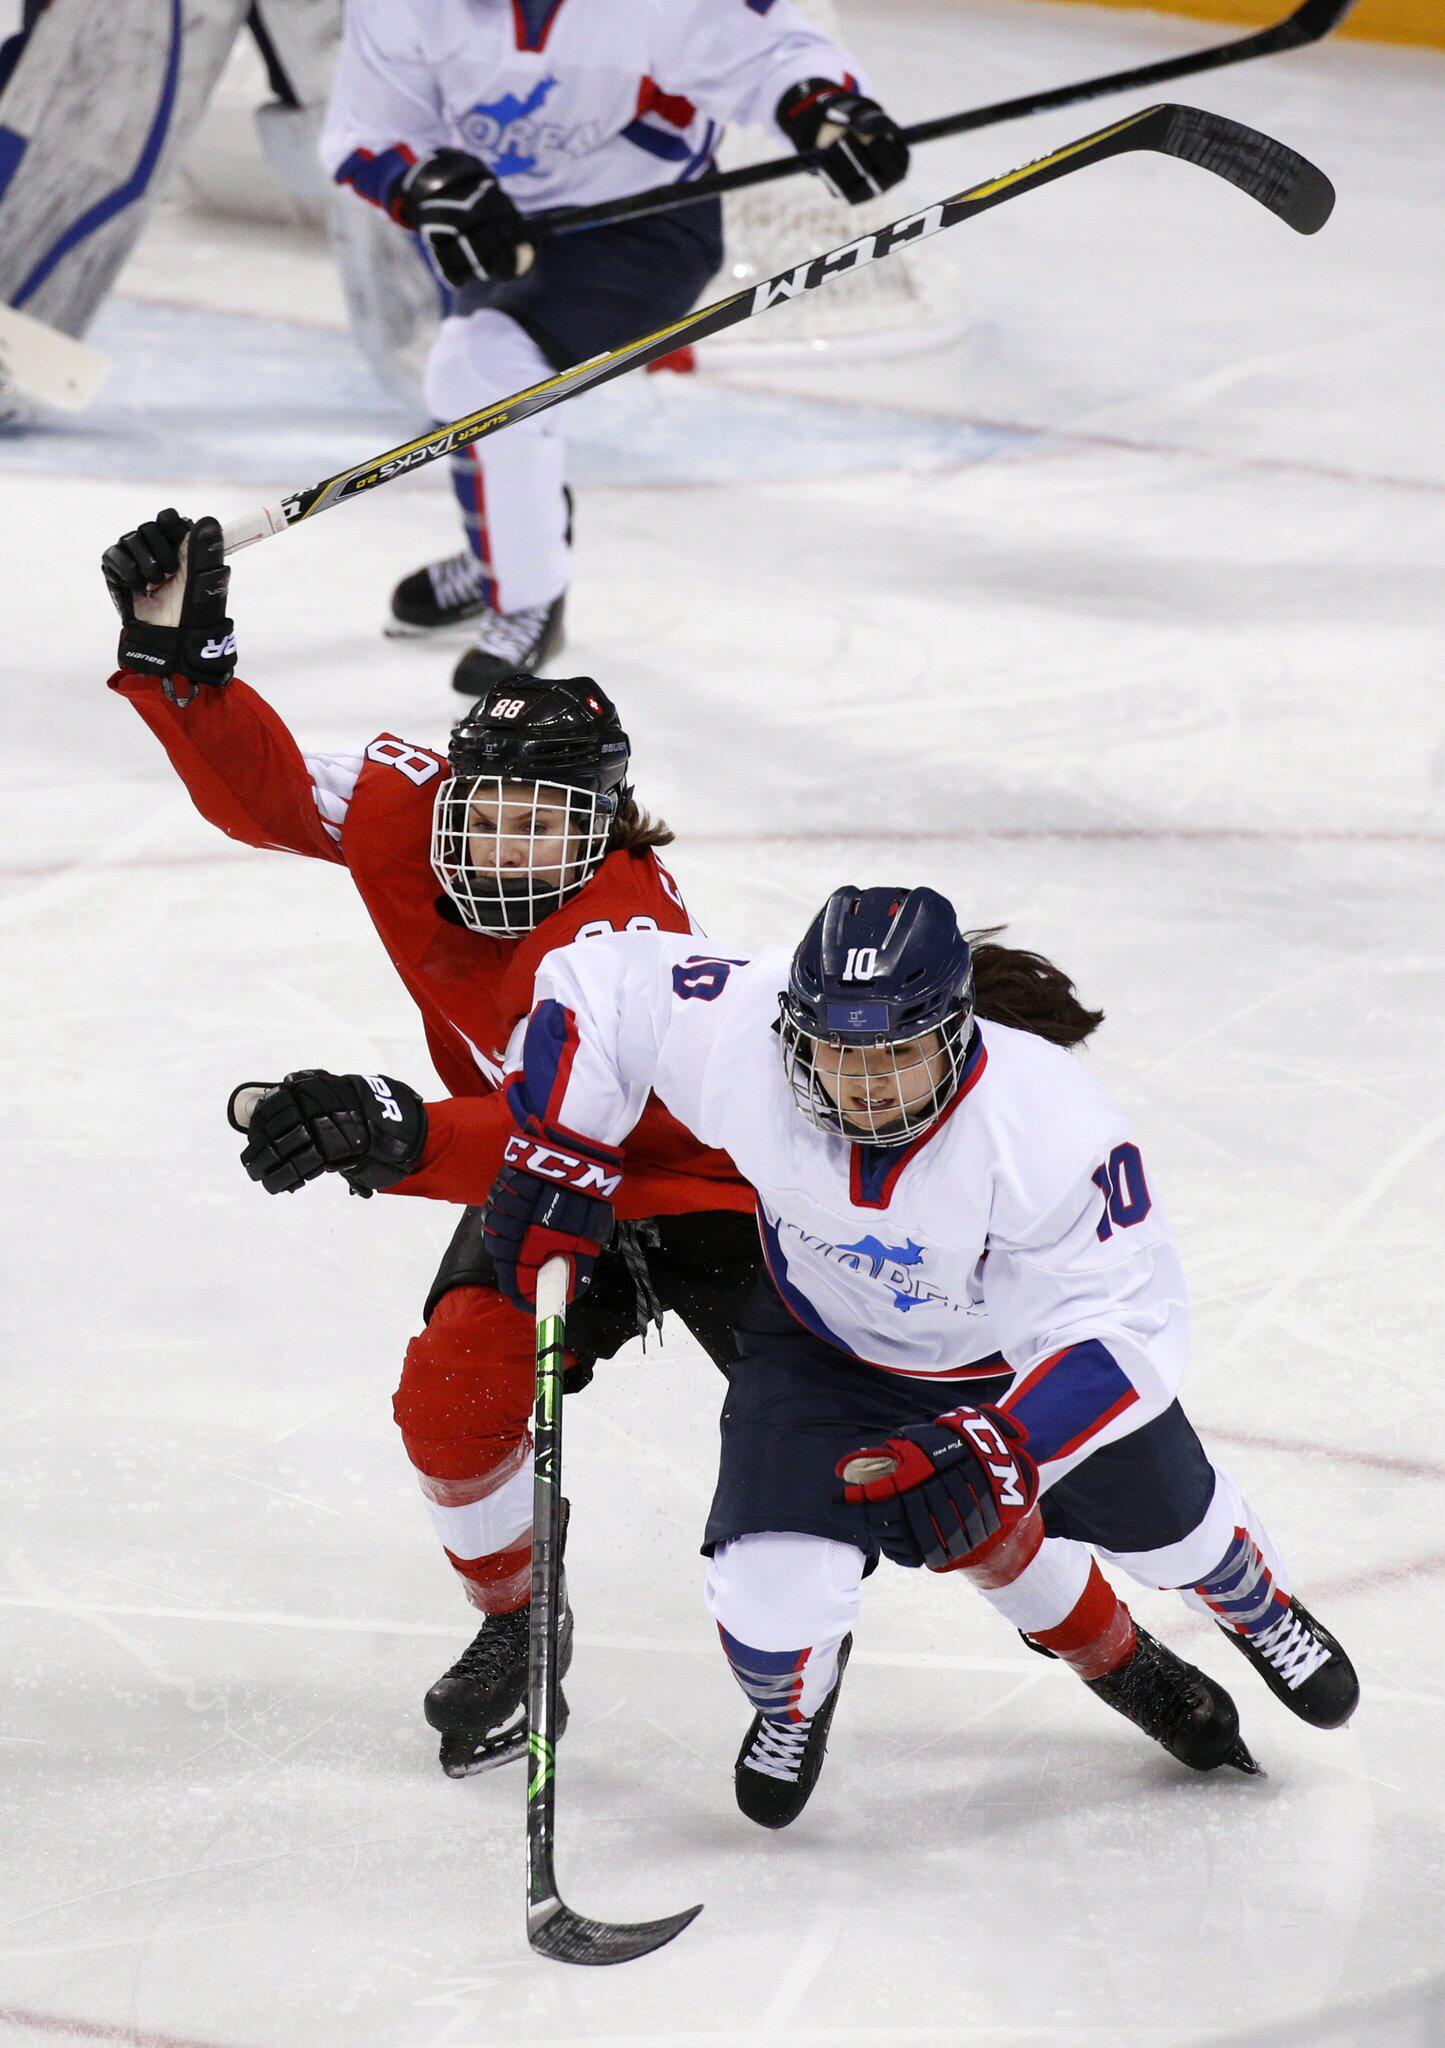 Bild zu Pyeongchang 2018 - Eishockey